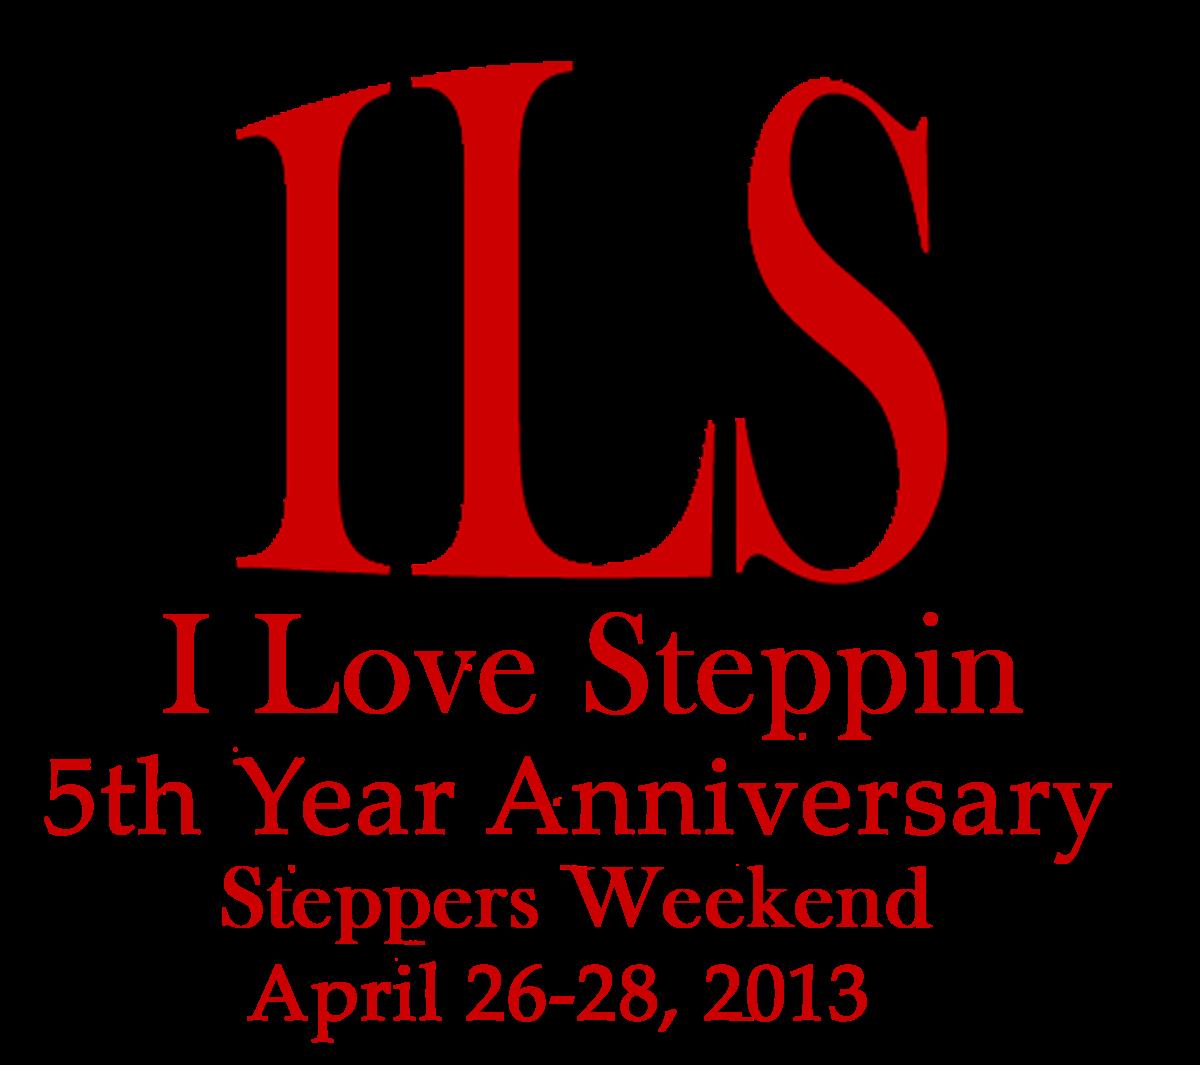 5th Year Anniversary: ILS Blog Spot: I Love Steppin 5th Year Anniversary